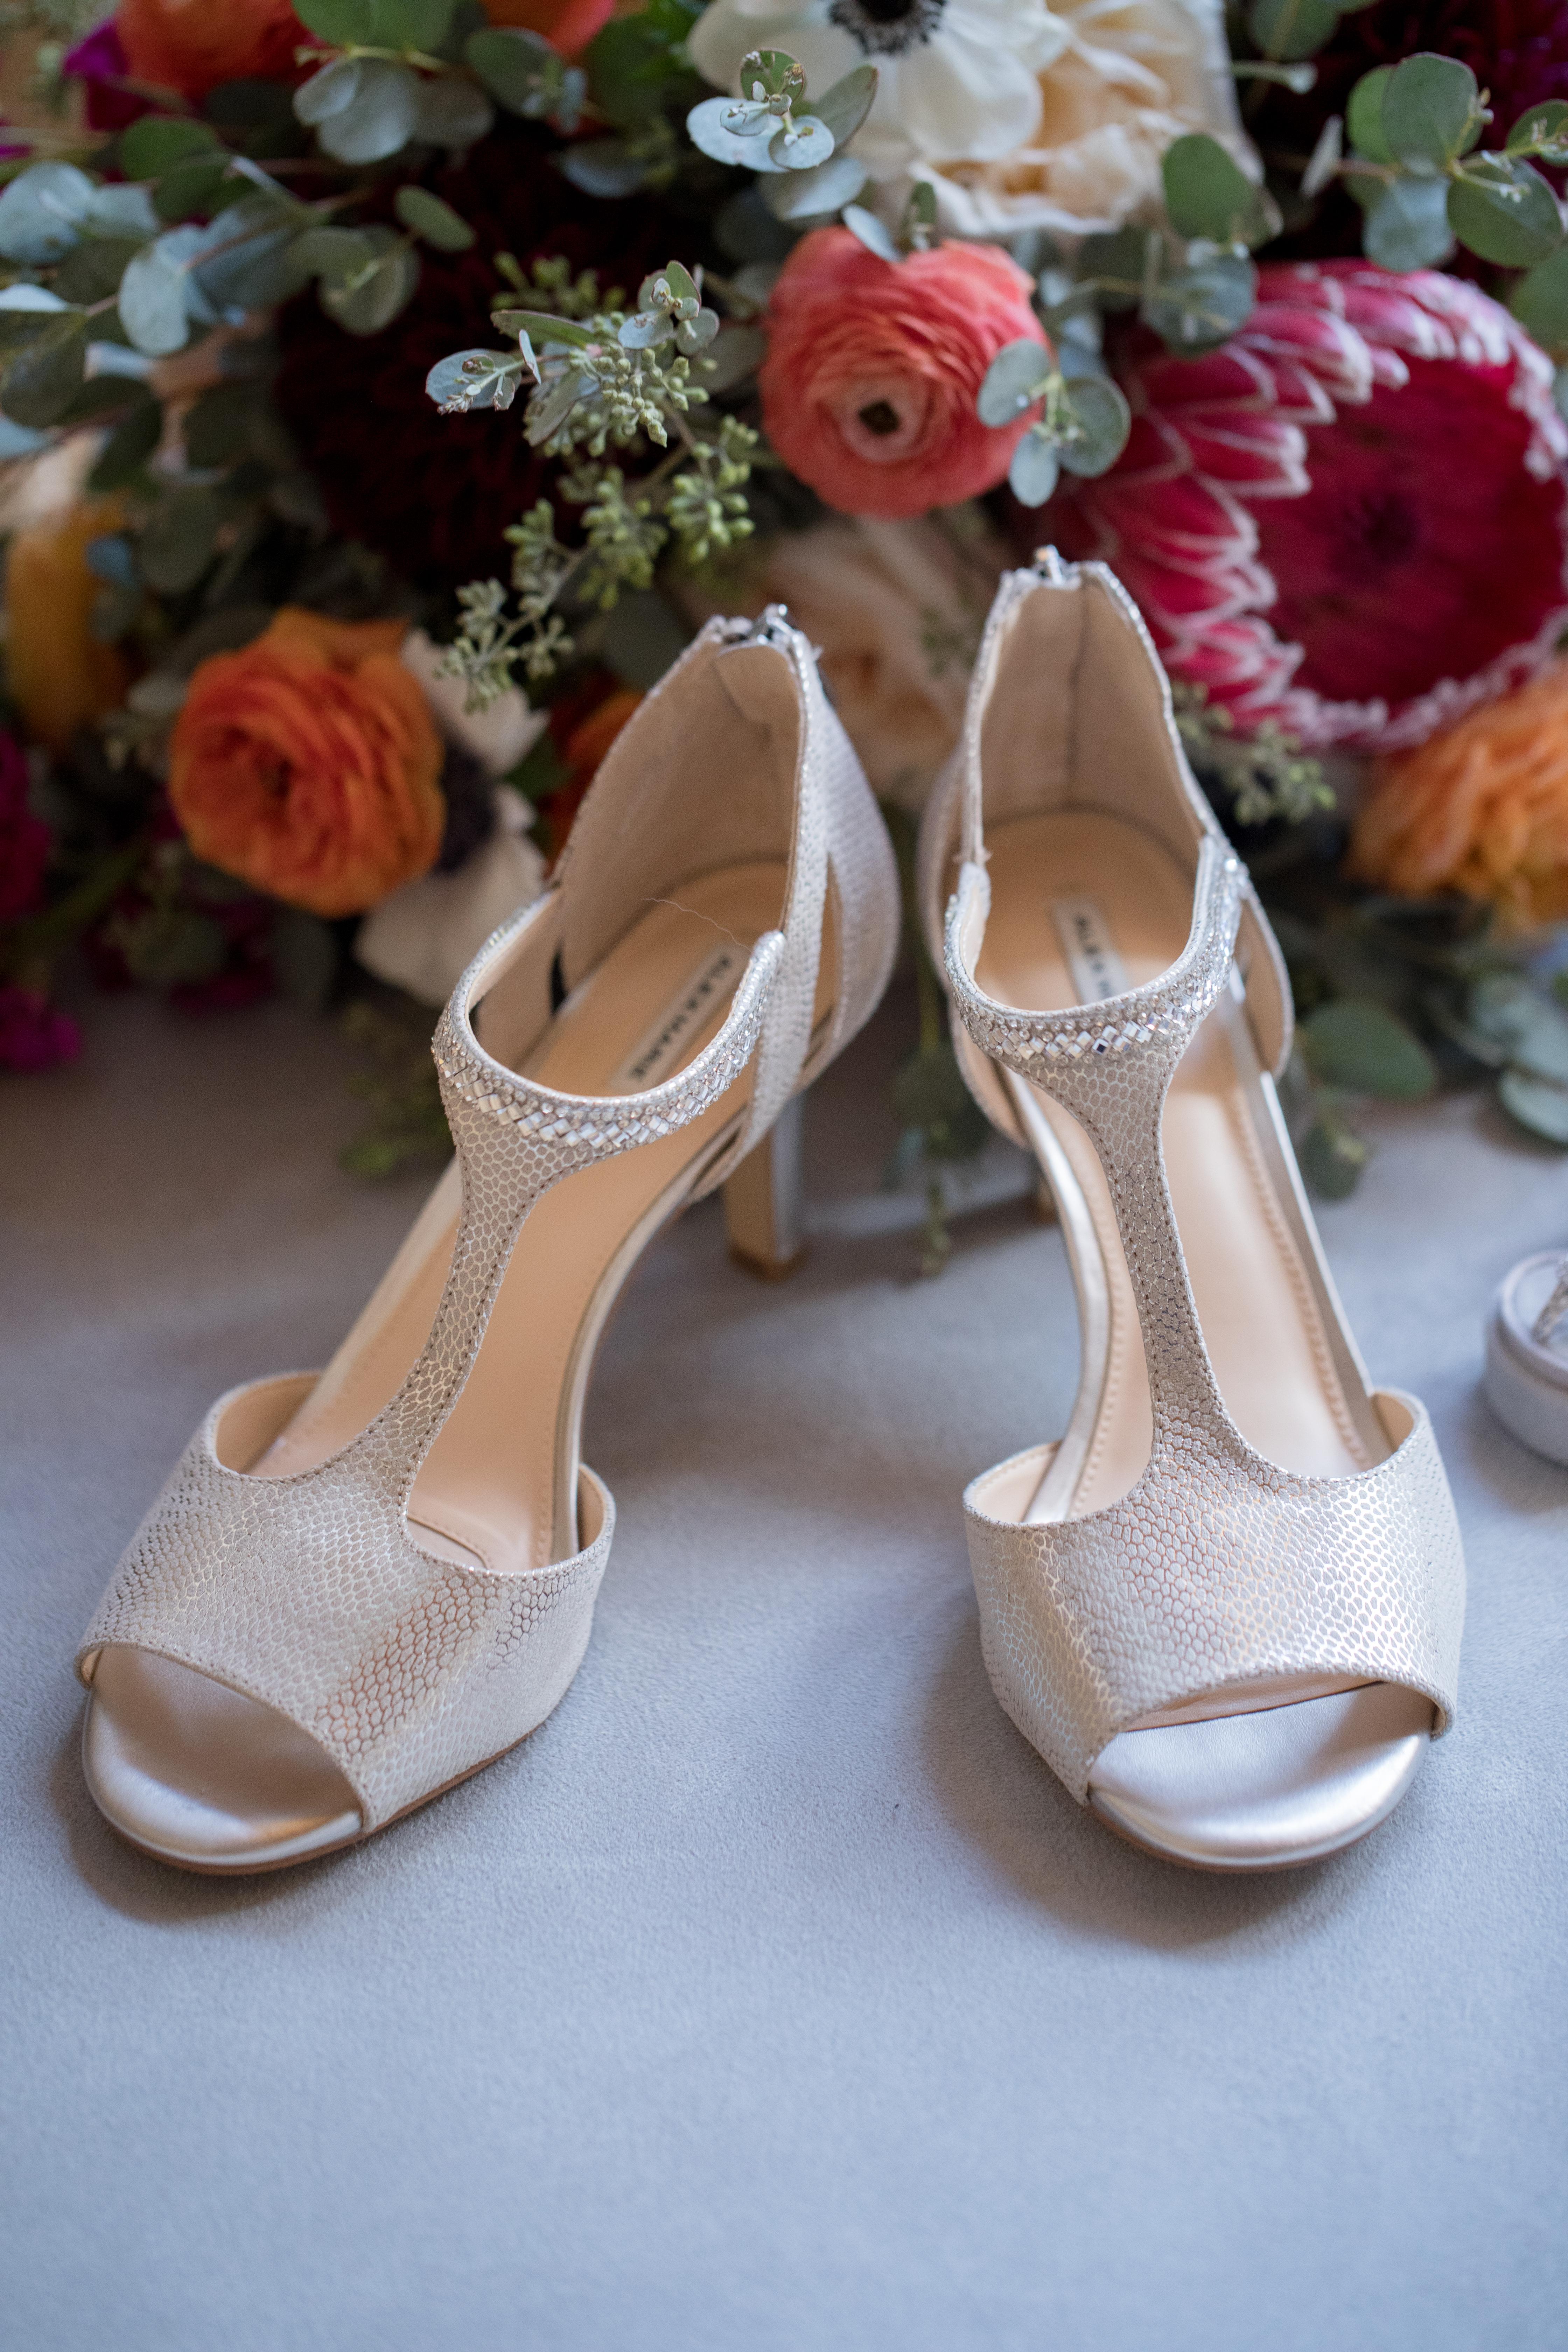 Private-Home-Rental-VRBO-Fall-Breckenridge-Colorado-Bride-Bouquet-and-High-Heels